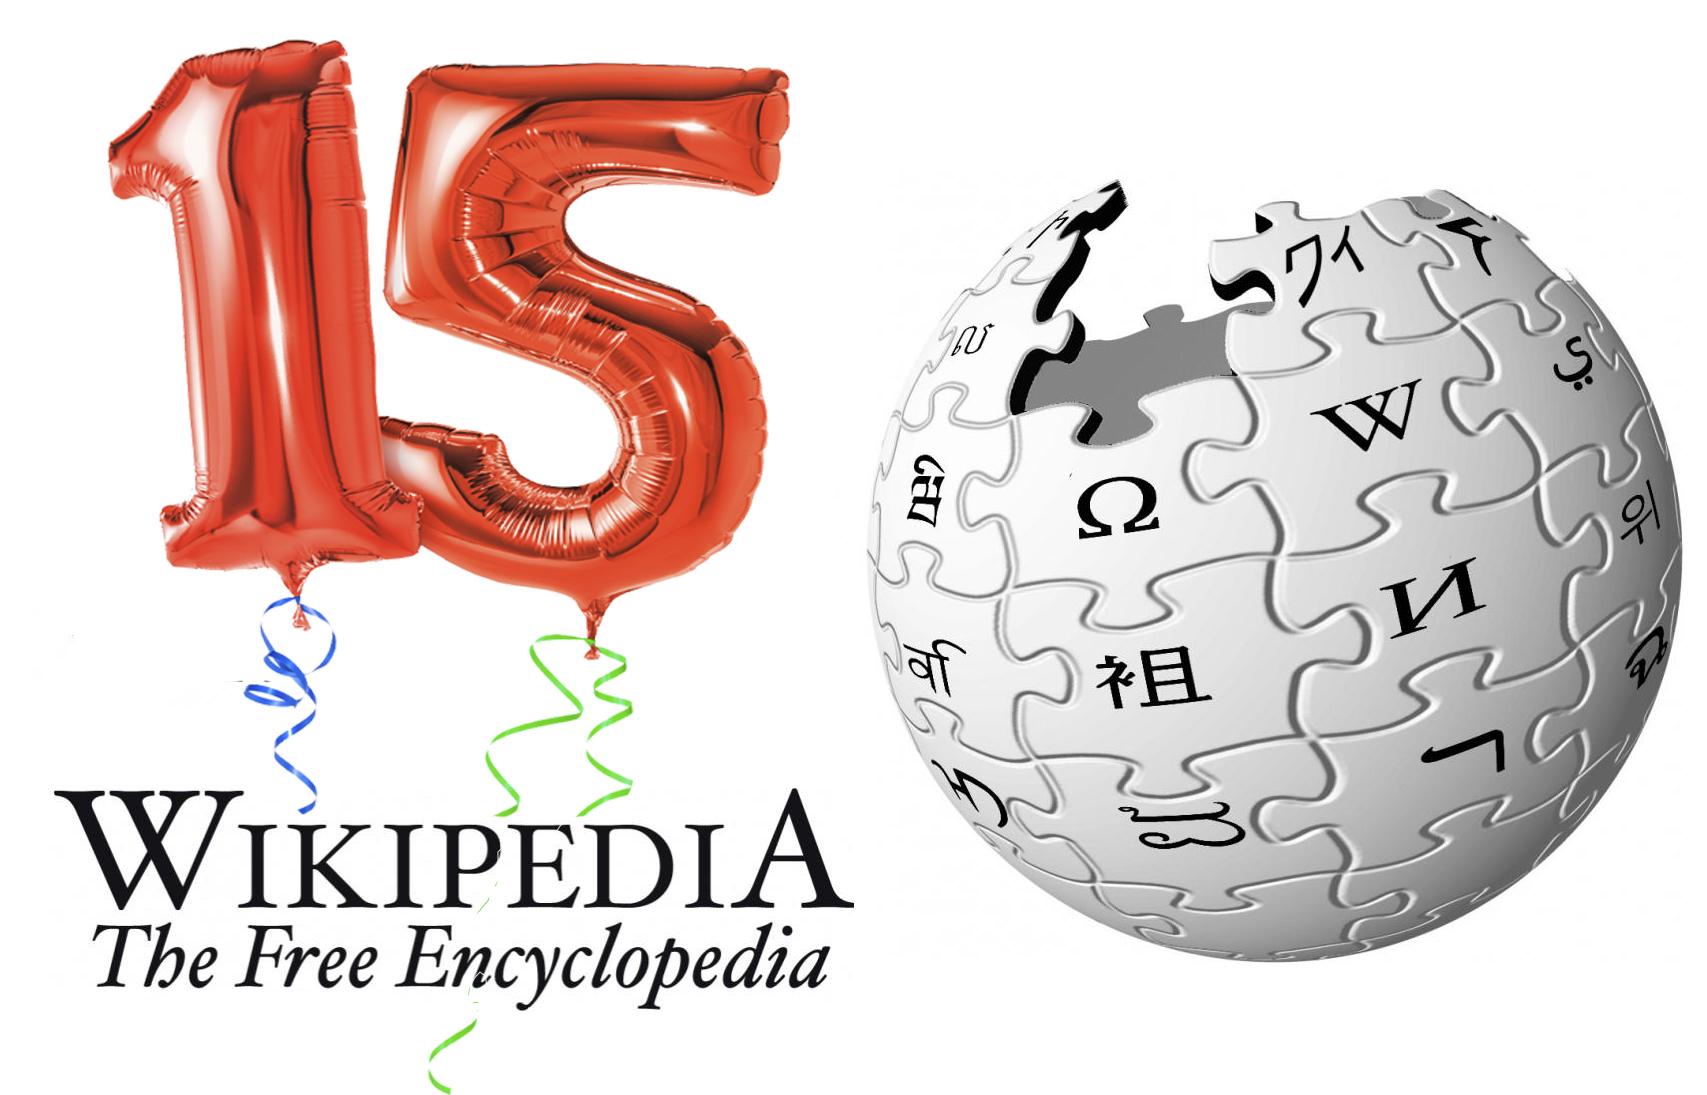 Wikipedia turns 15